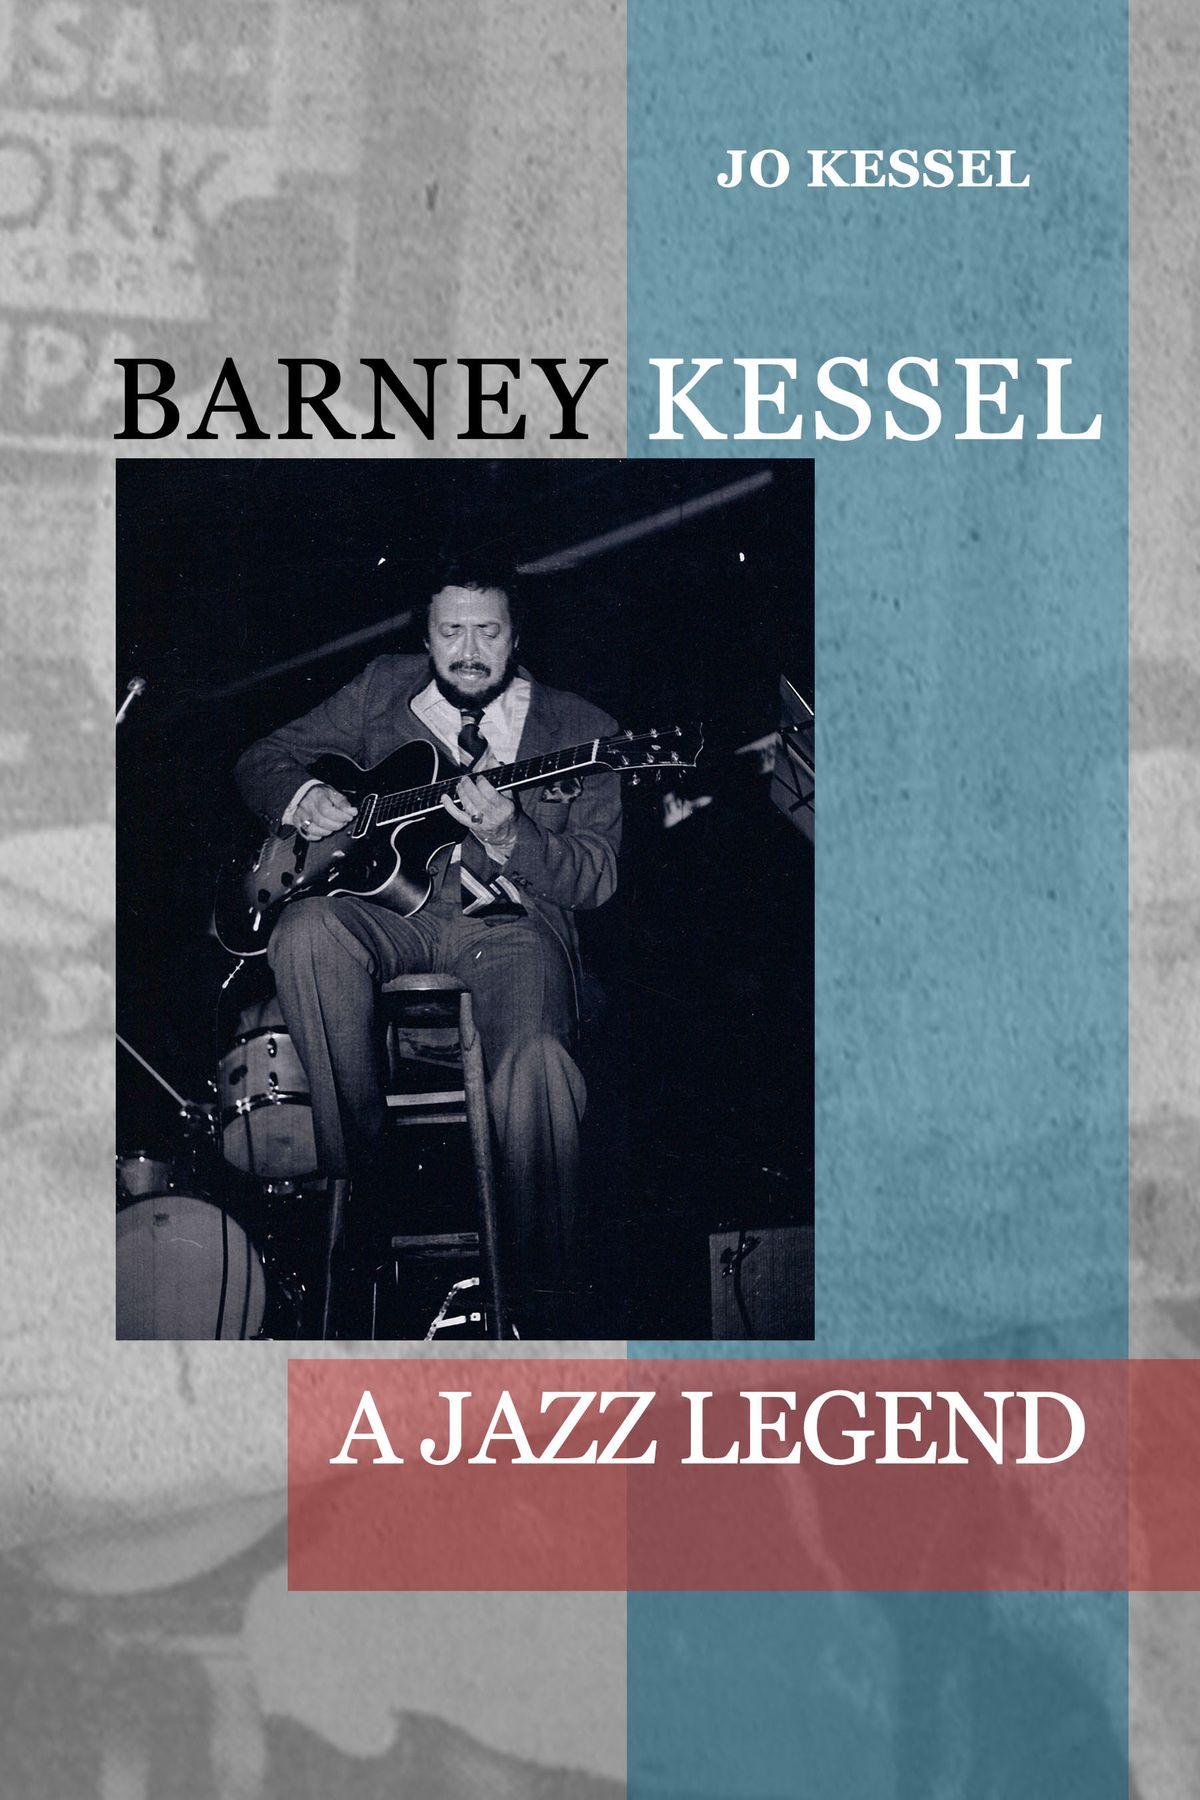 BARNEY KESSEL.jpg